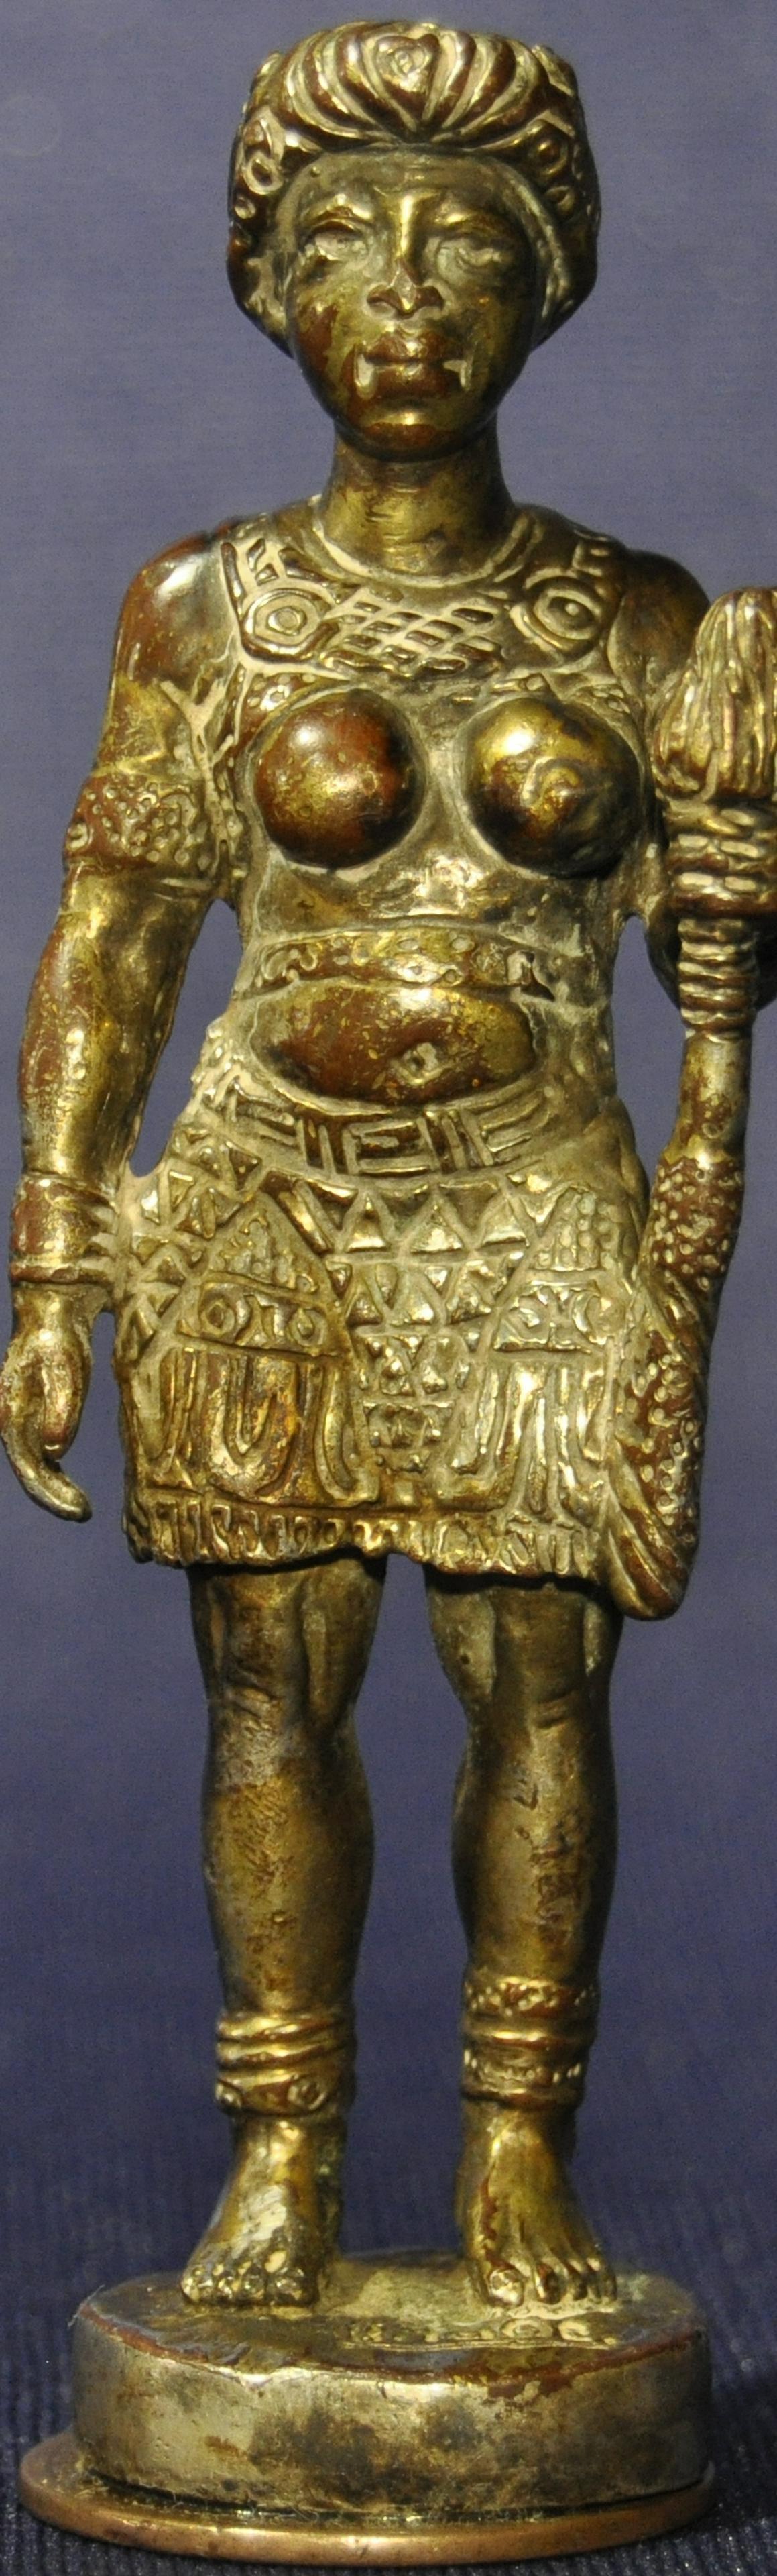 Queen Ana Nzinga Diminutive Bronze Figure